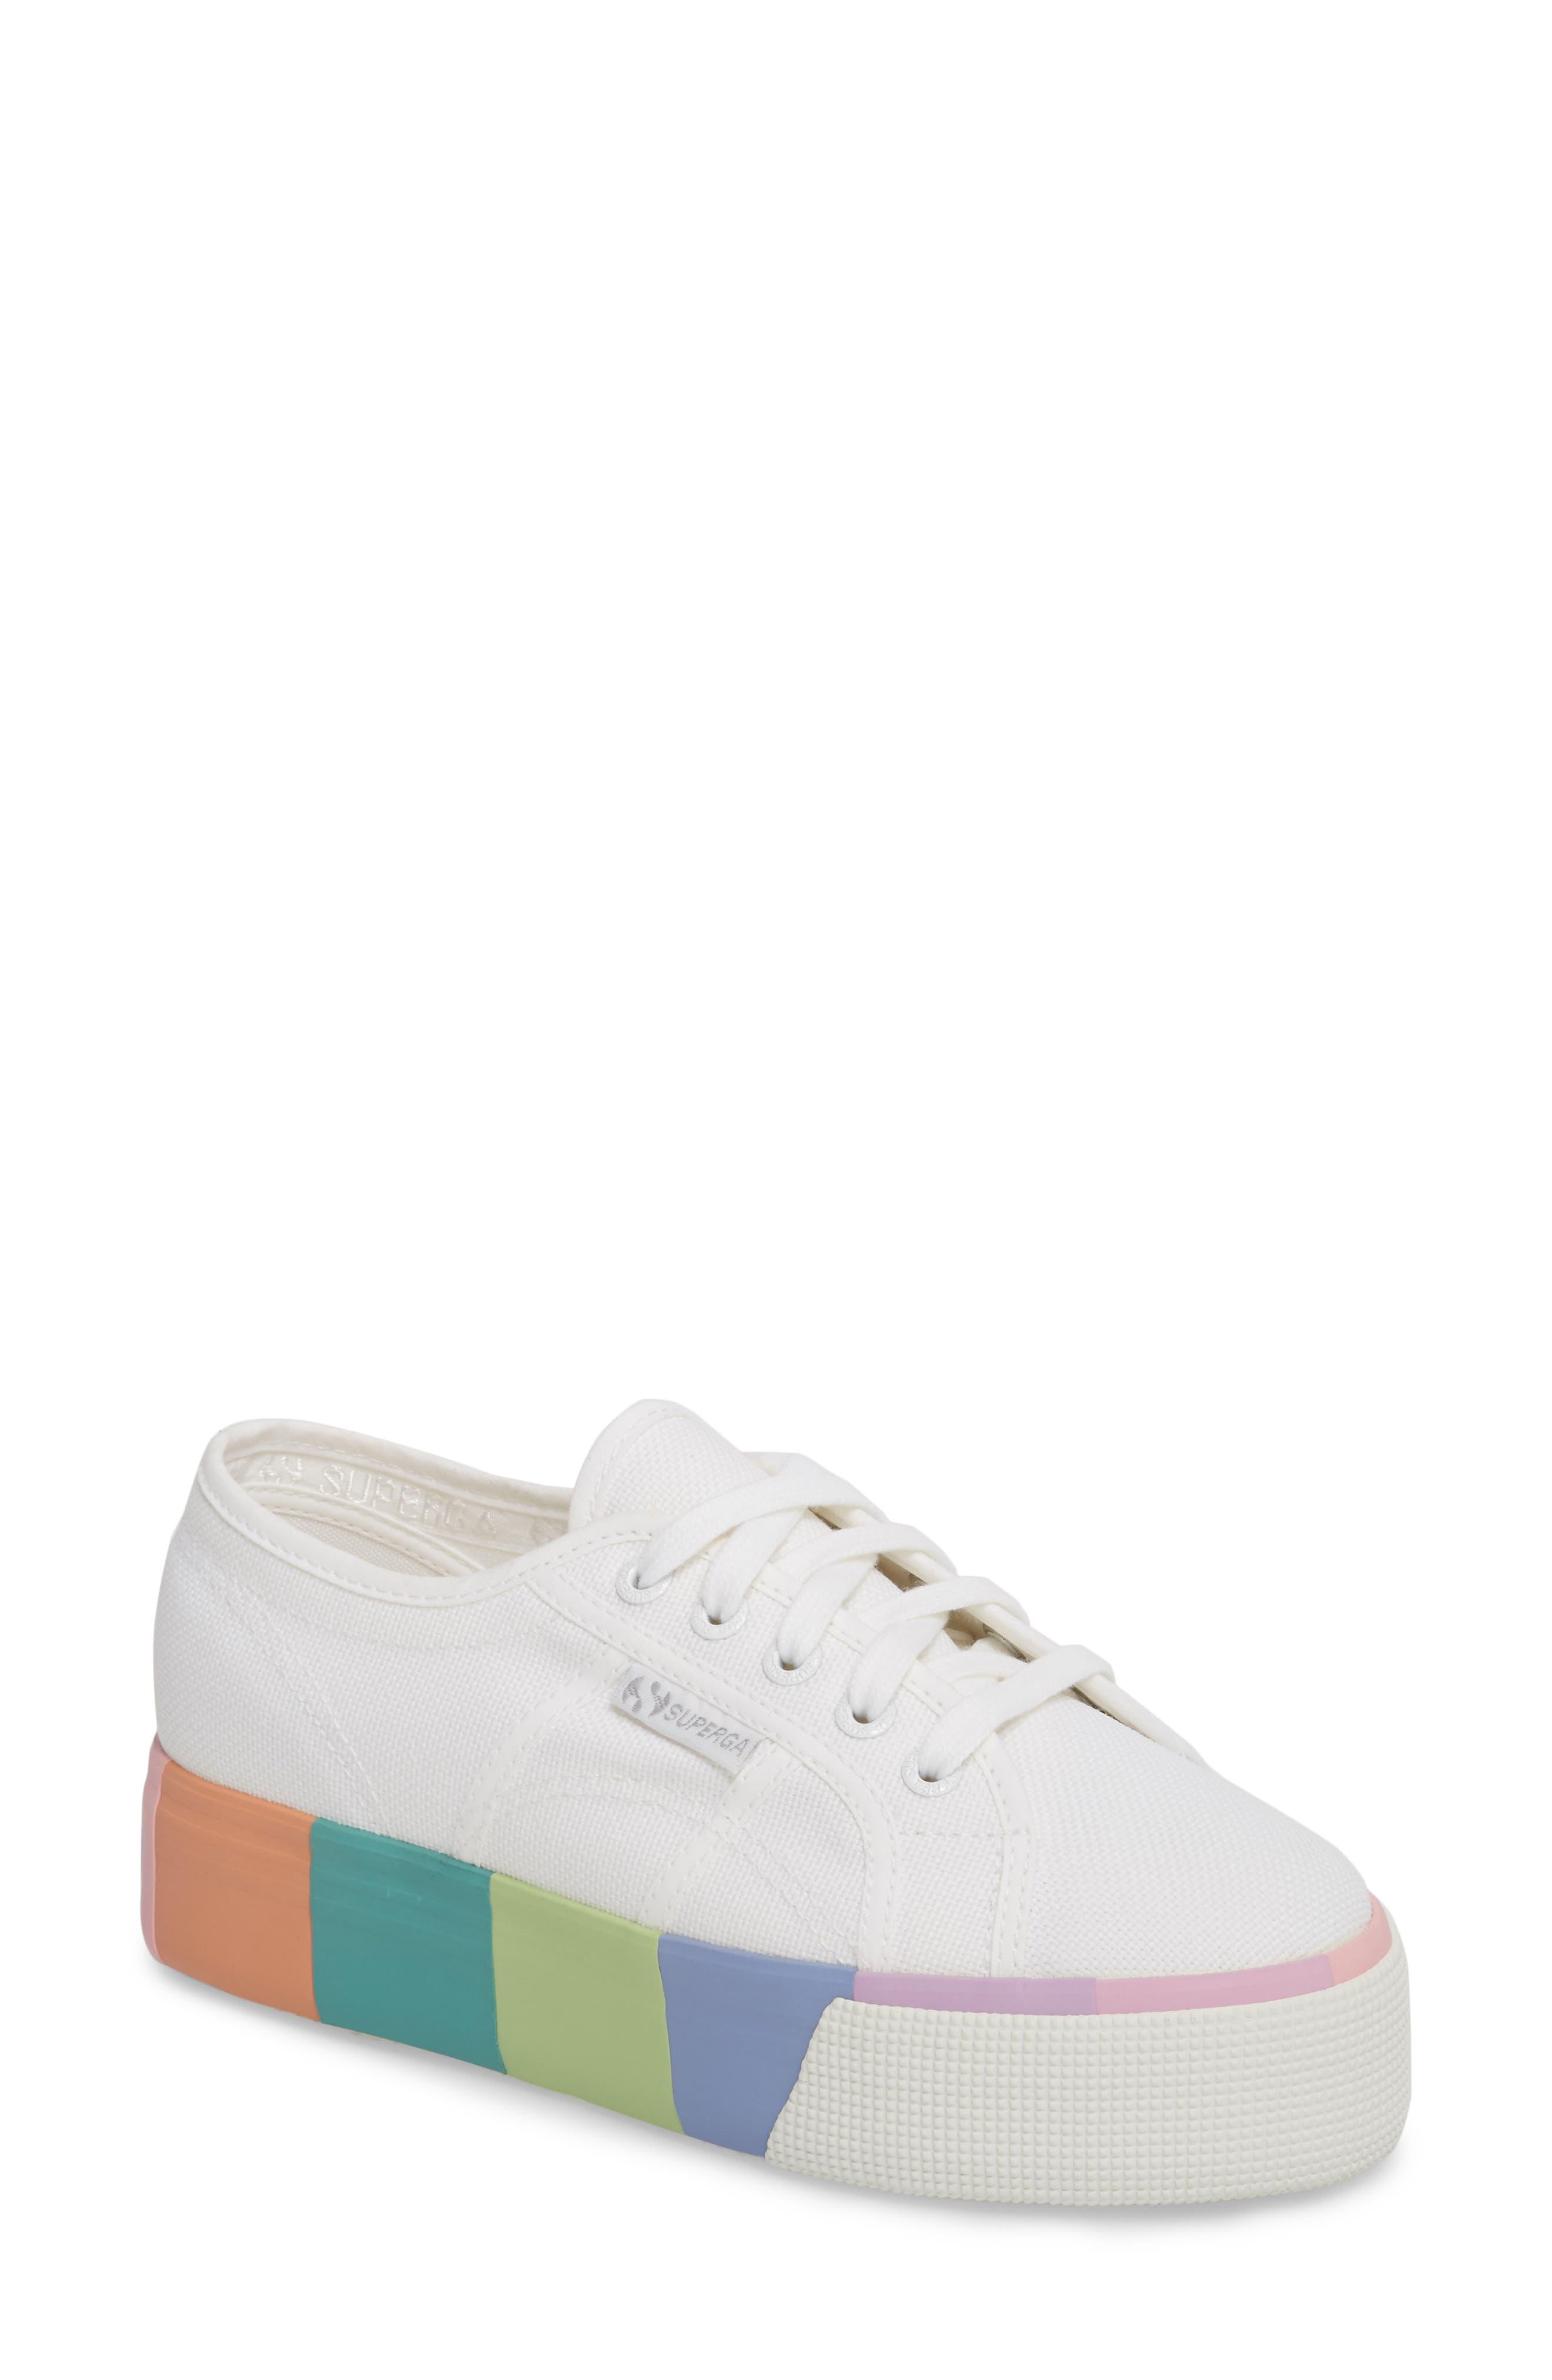 2790 Platform Sneaker,                             Main thumbnail 1, color,                             100